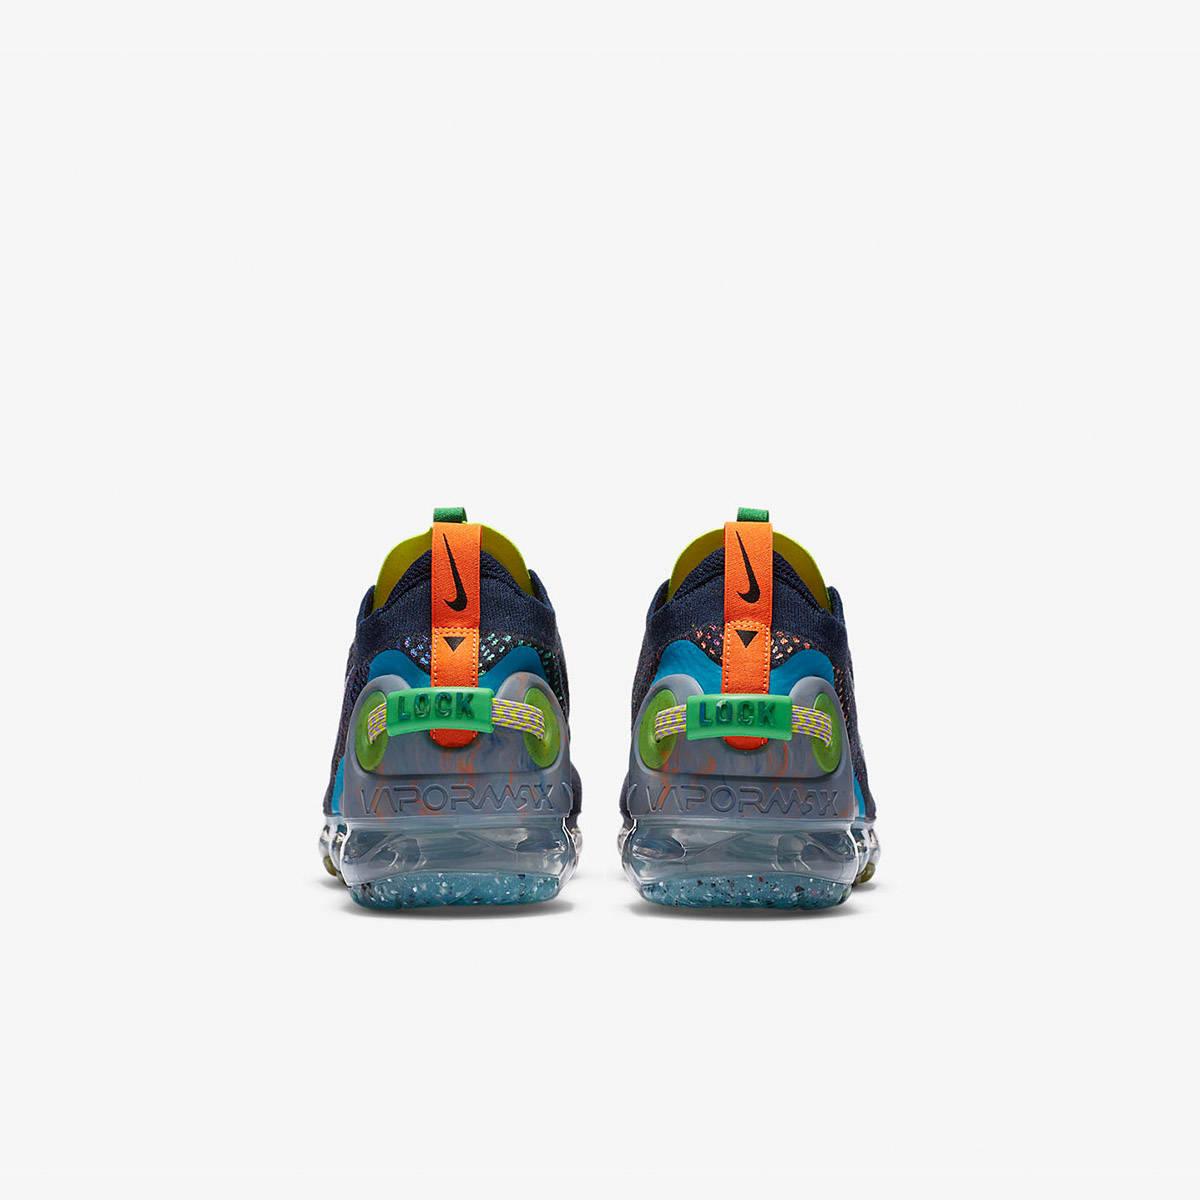 Nike Air Vapormax 2020 Flyknit - CJ6740-400